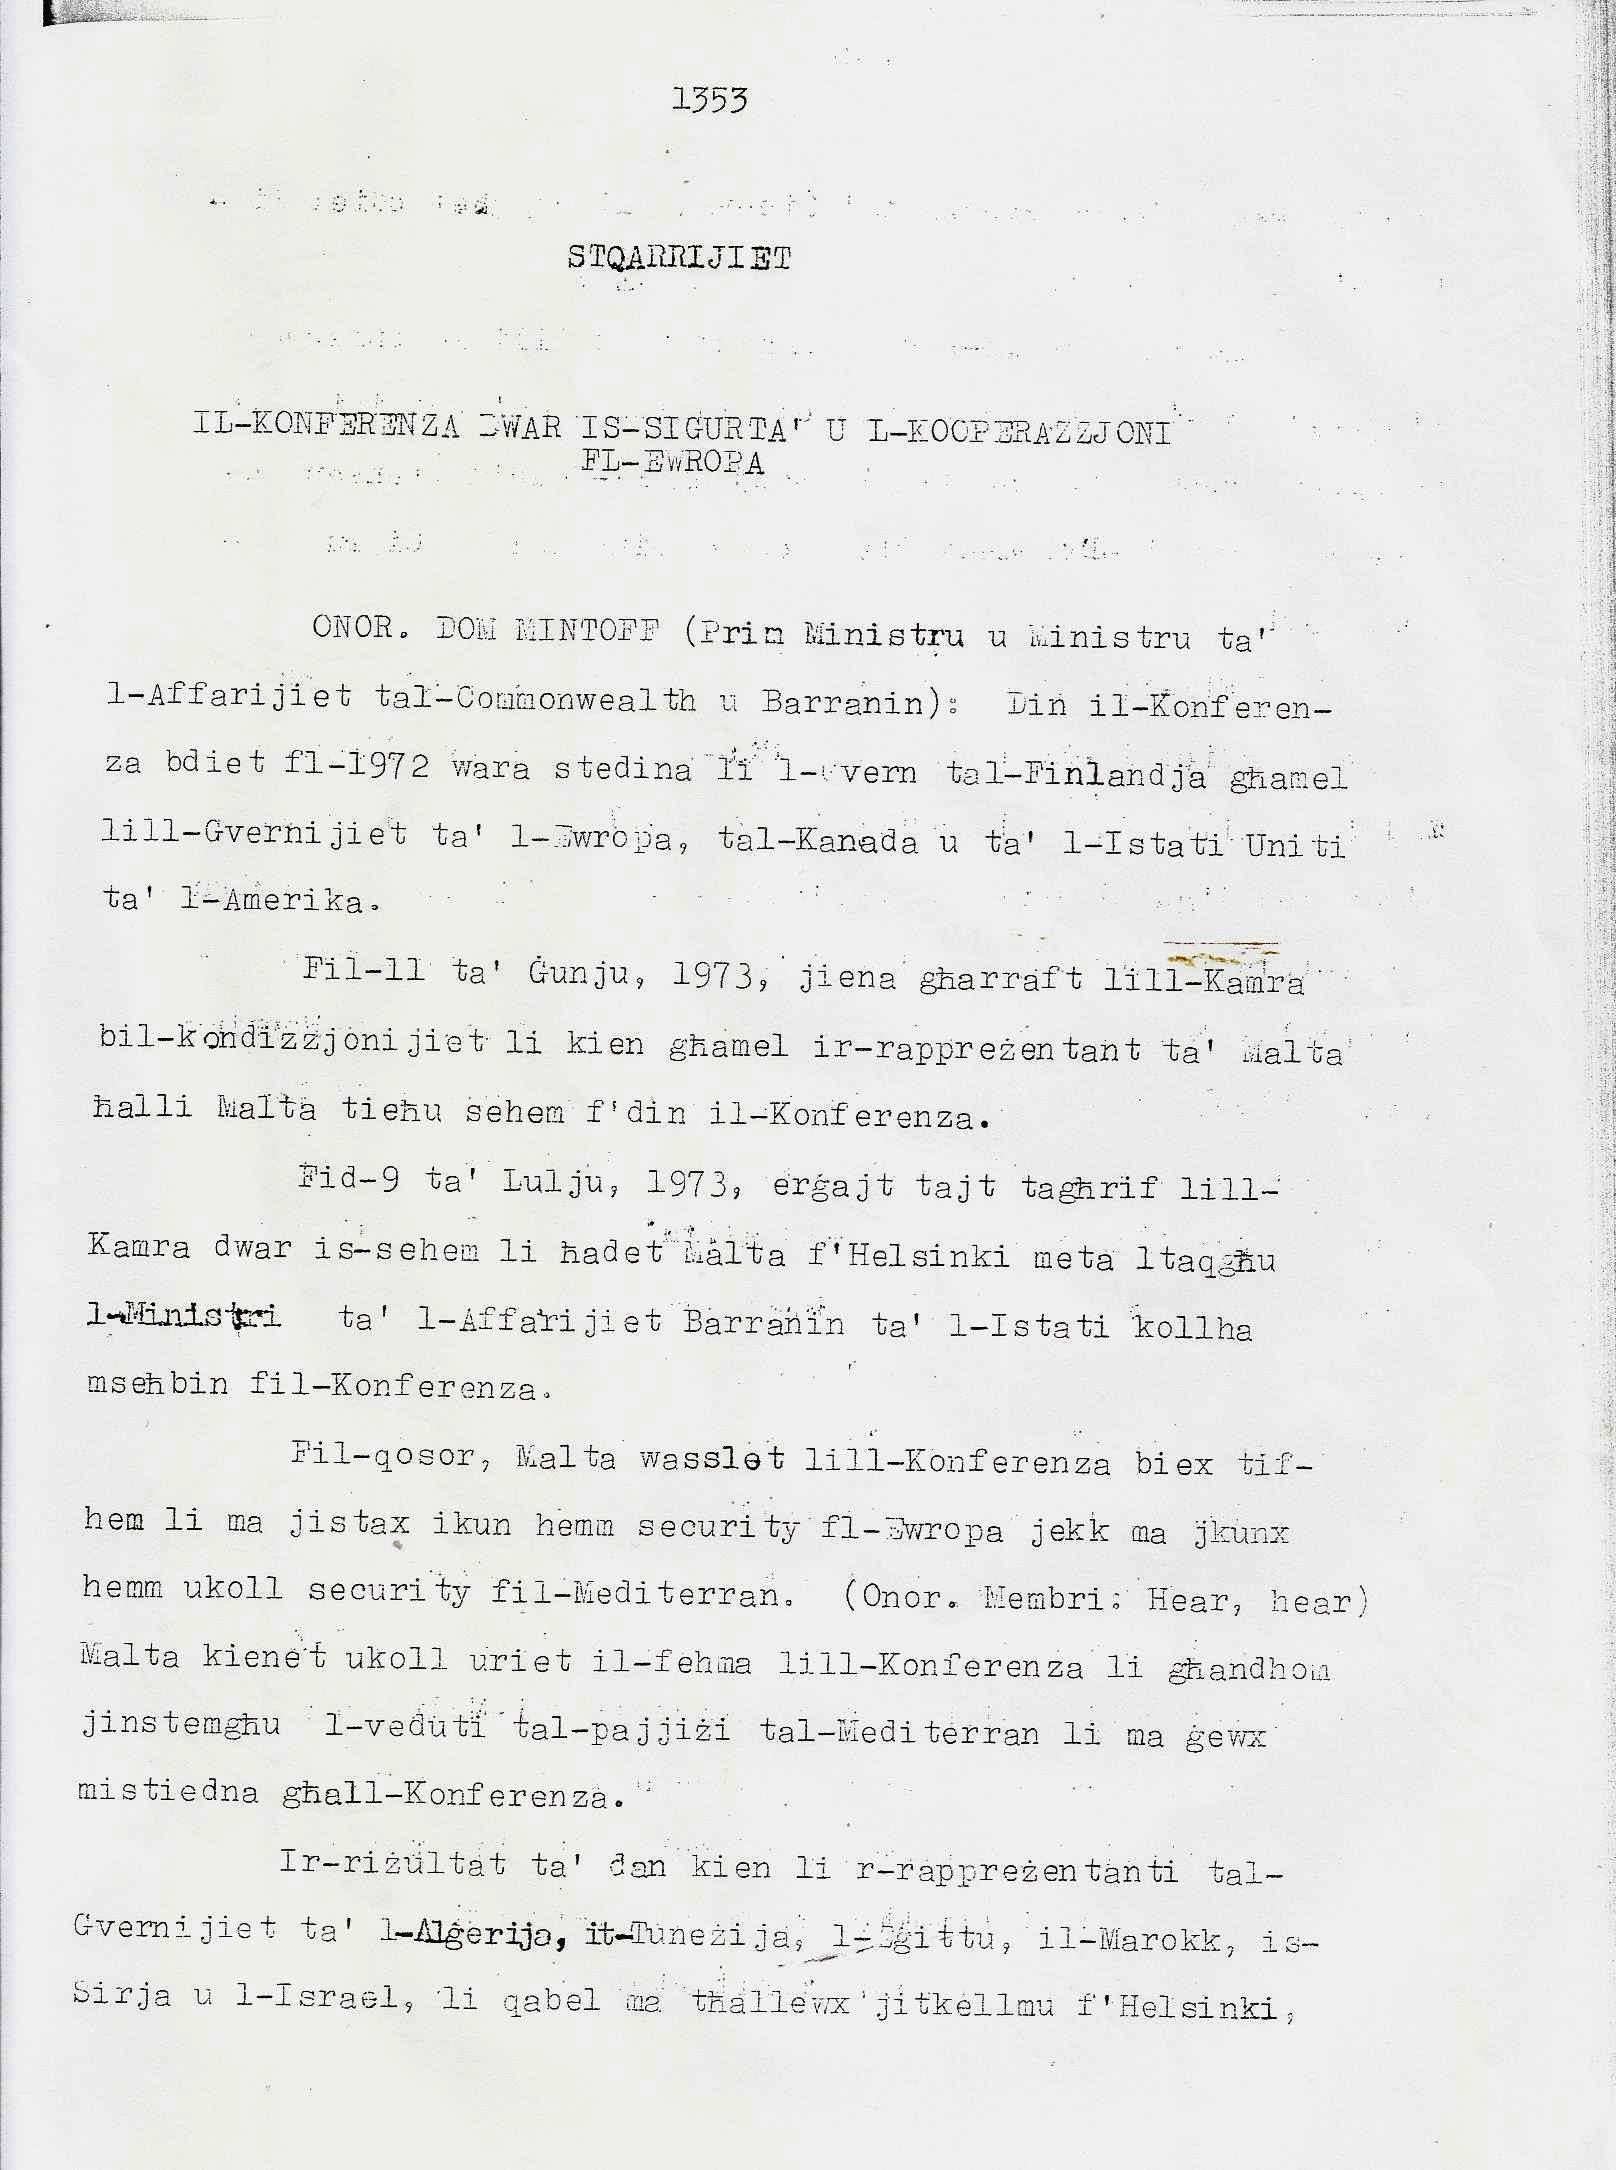 1. Dom Mintoff Parlament 15-7-1975